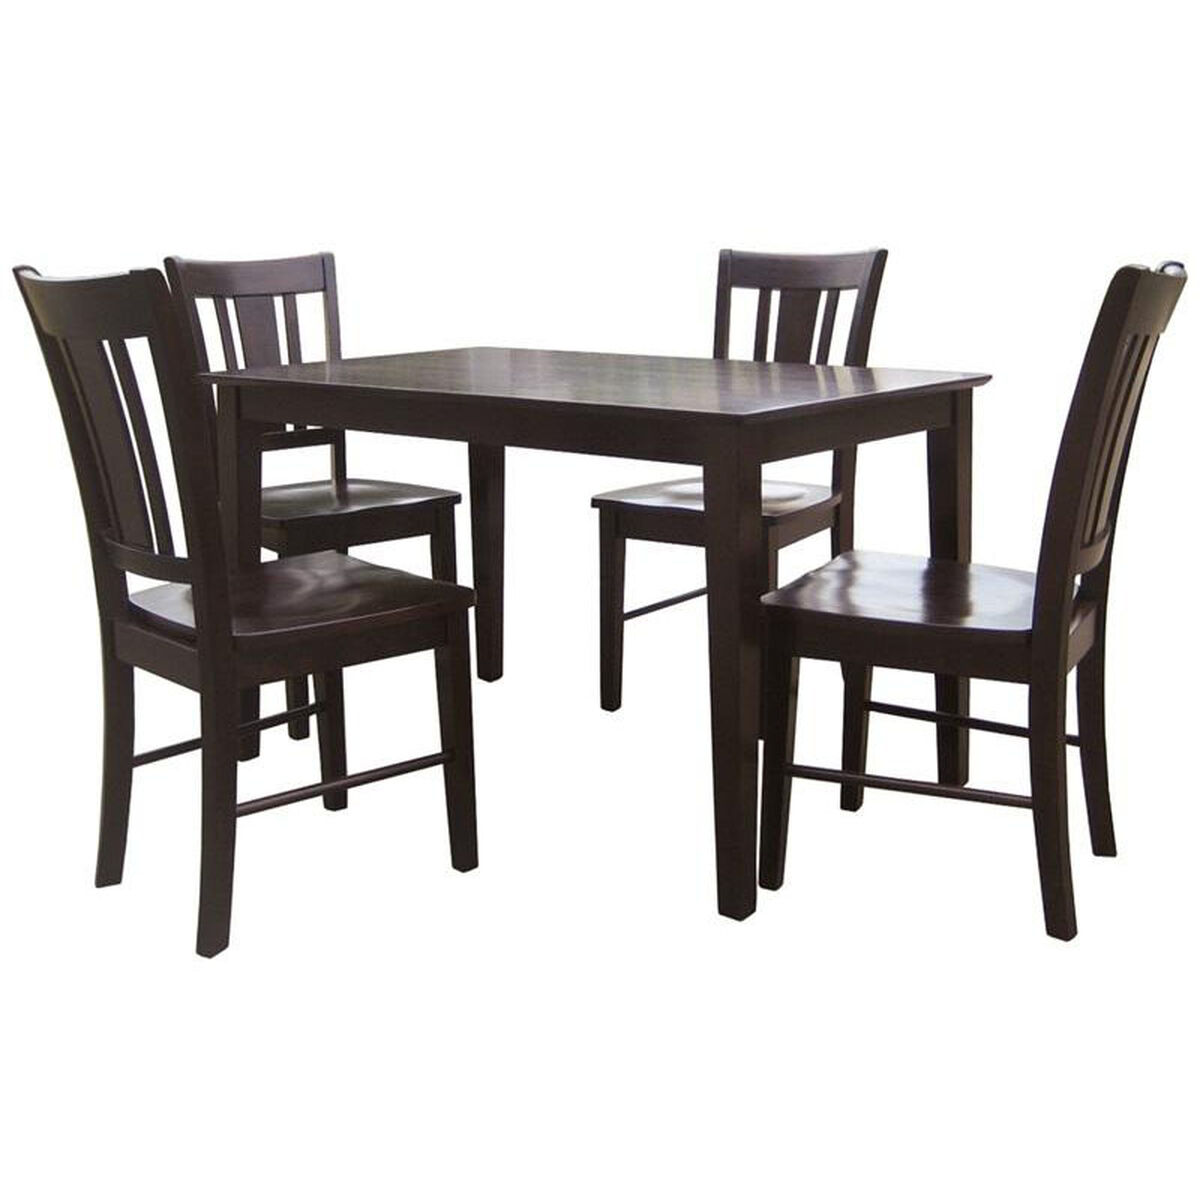 Mocha Finish Dining Room Sets